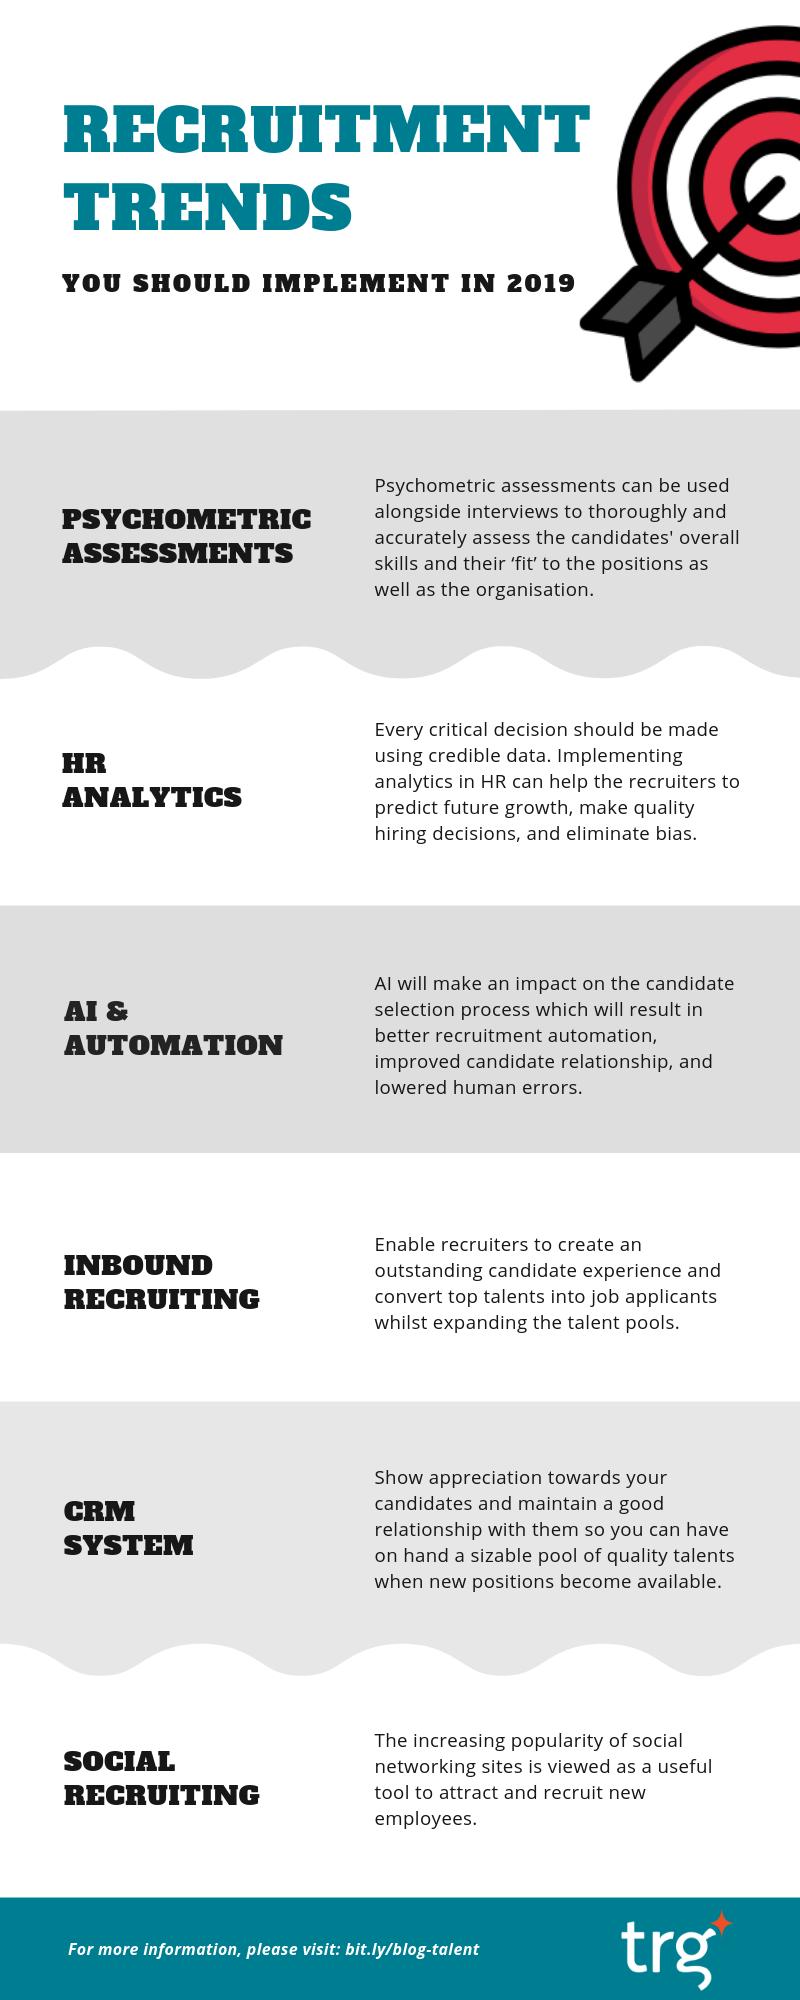 6 recruitment trends of 2019